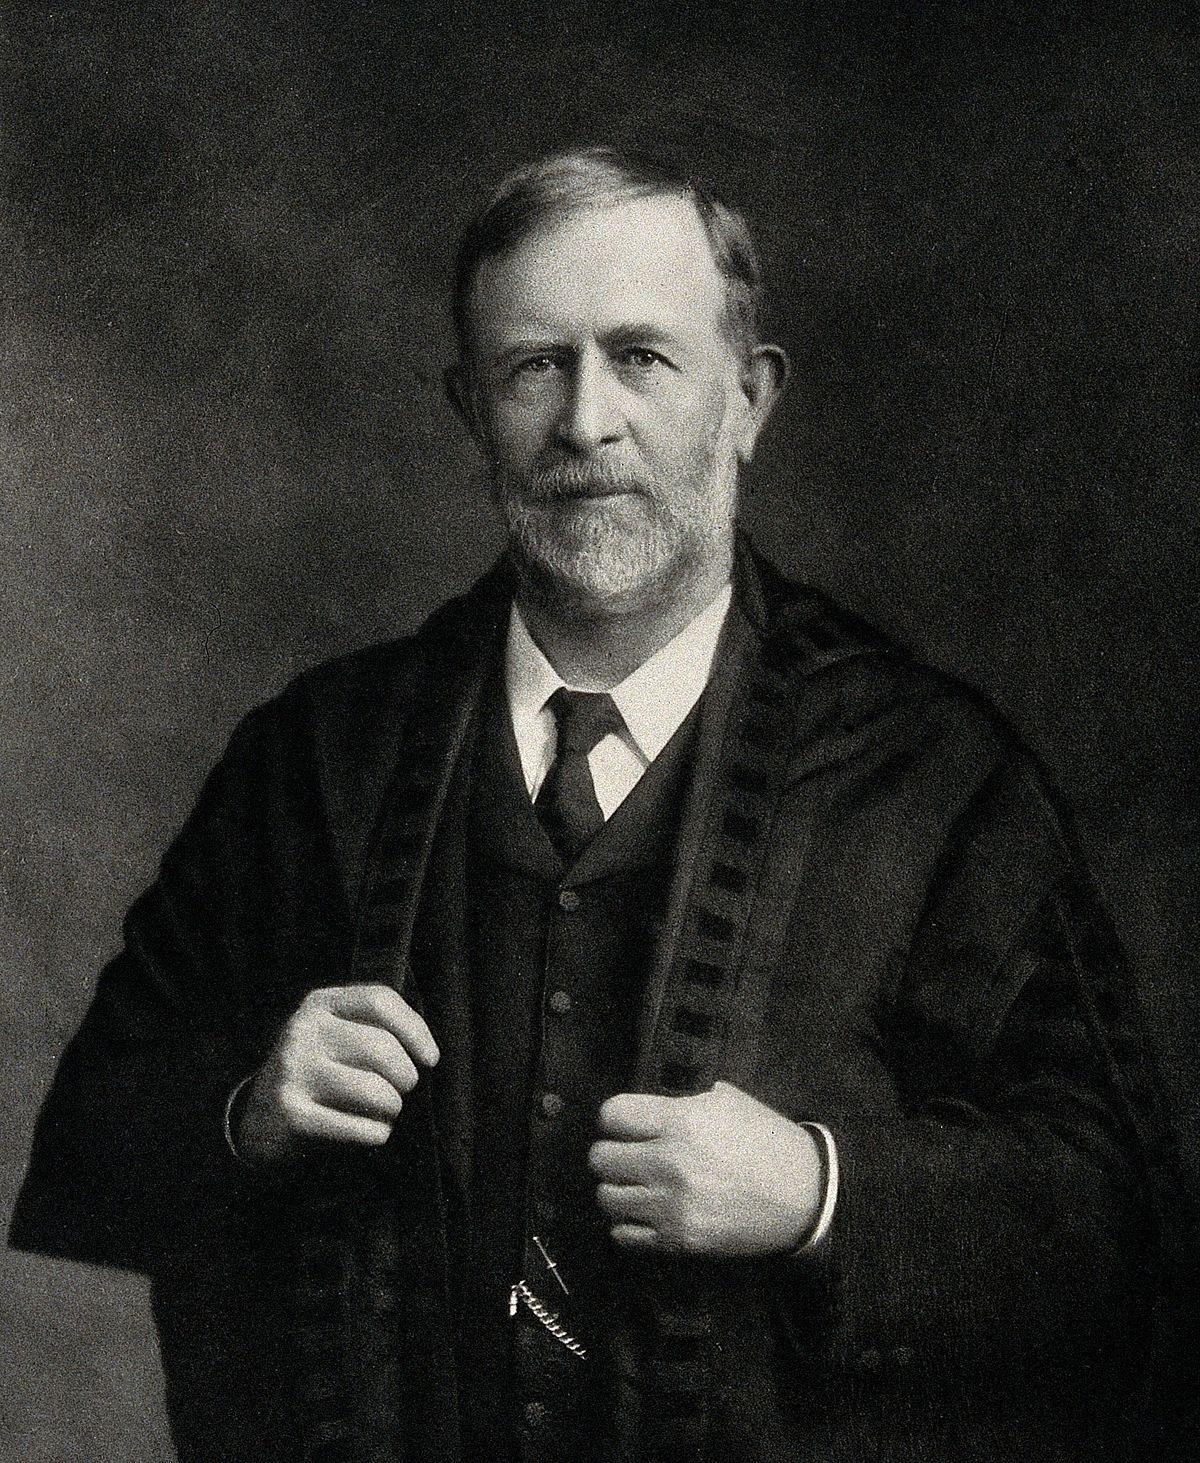 Rowan Family Medicine >> Sir Norman Moore, 1st Baronet - Wikipedia